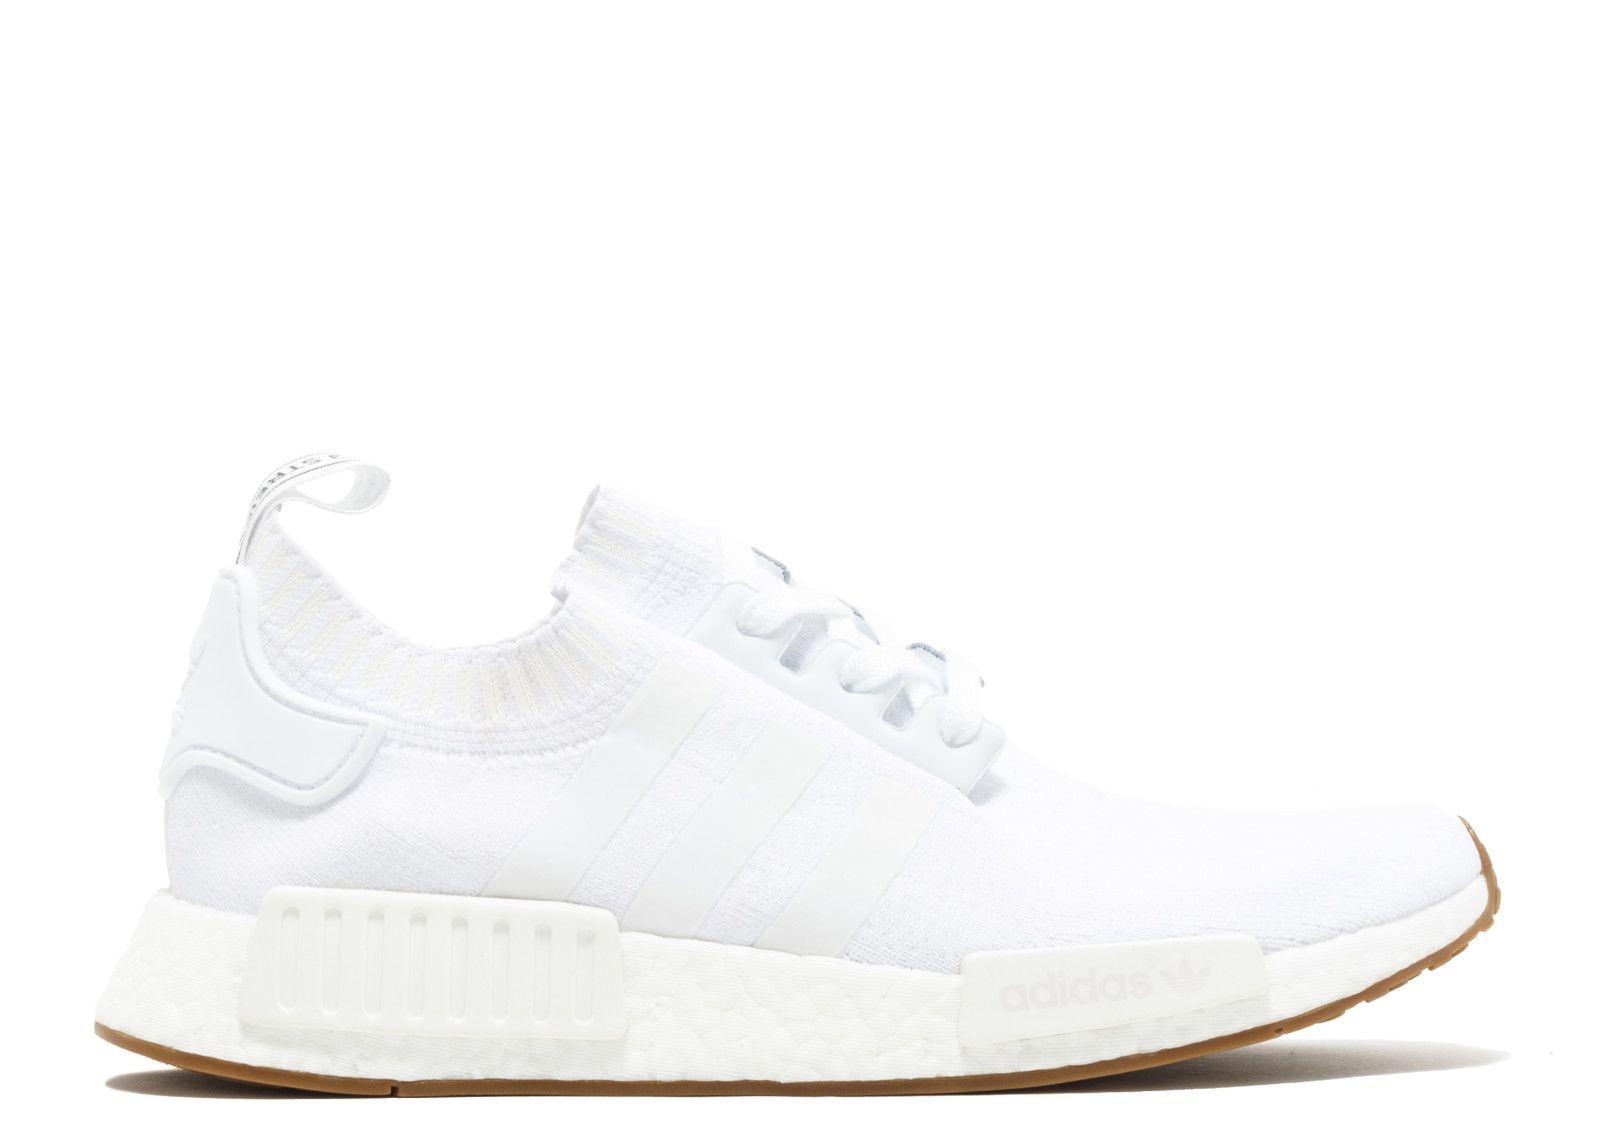 Adidas Nmd R1 Pk White Gum 200 00 Sneakers Men Adidas